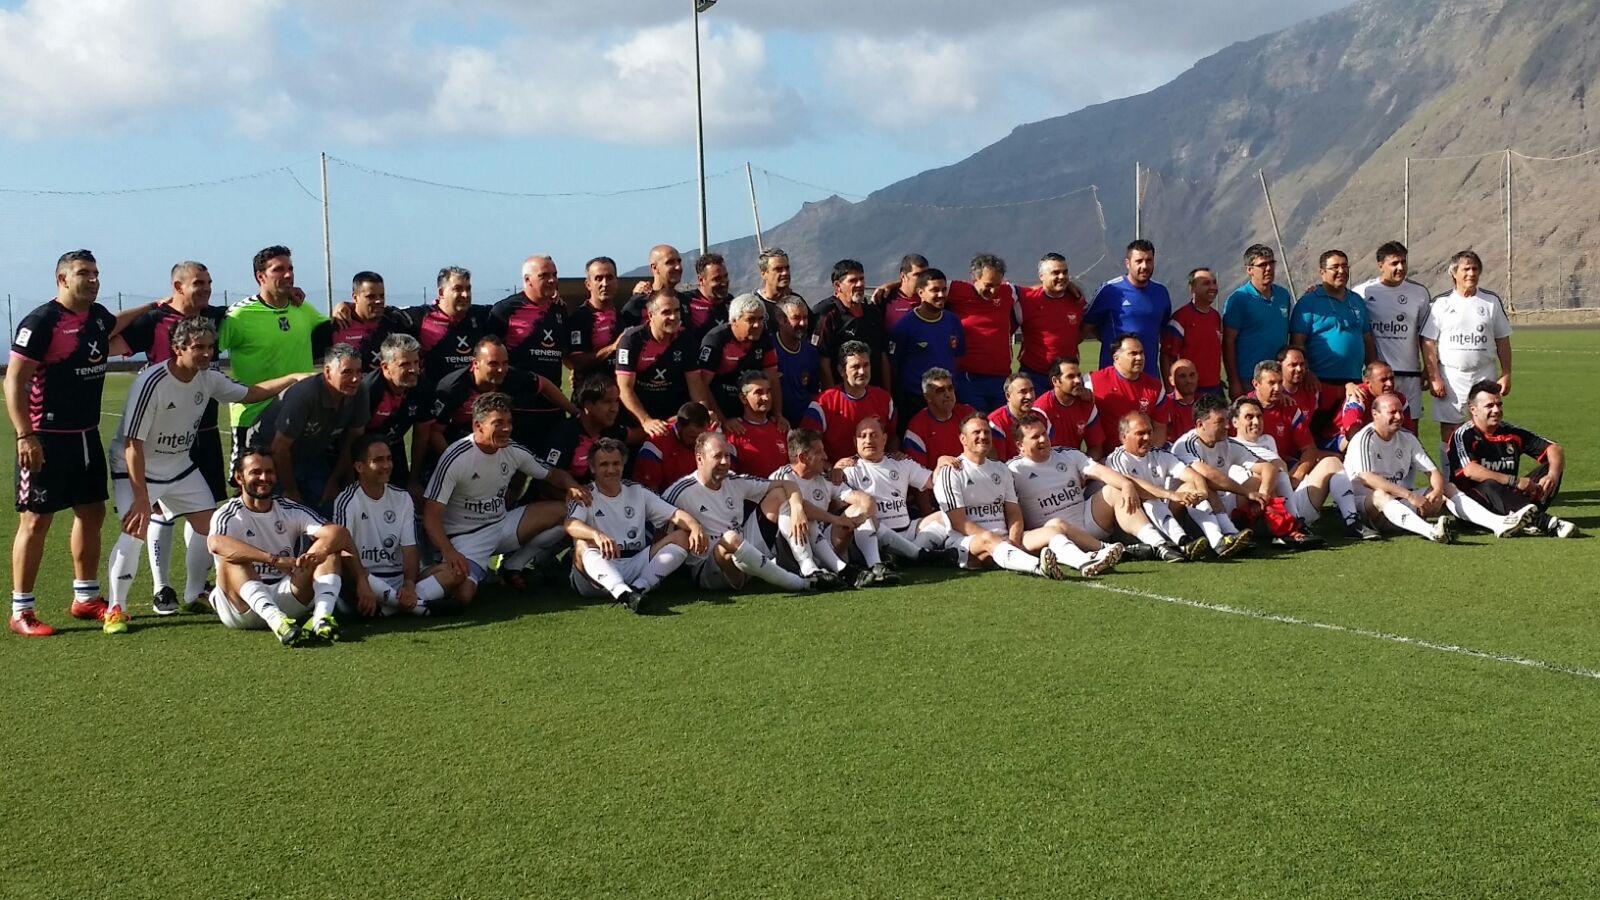 VCB-AJUTE-SALMOR (Vtnos Cantera R.Madrid y del CD Tenerife)